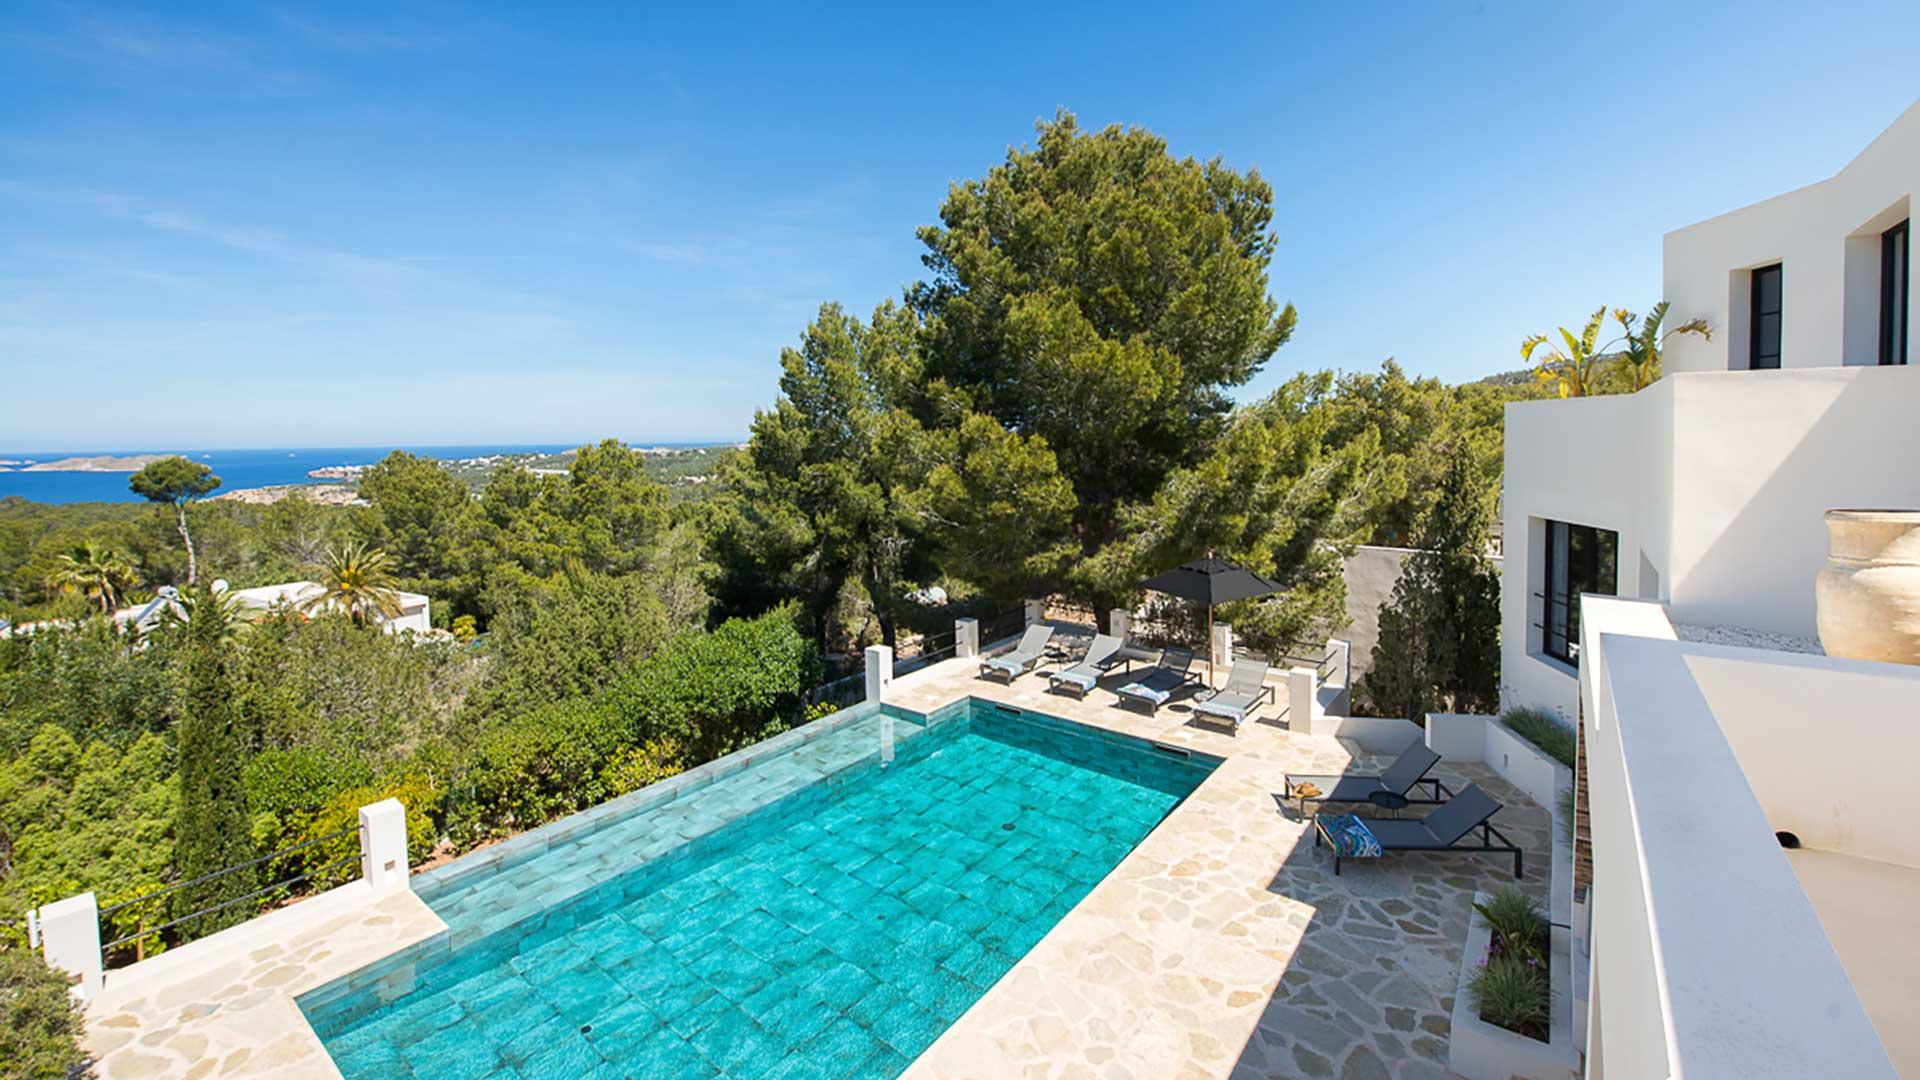 Villa Villa 843, Rental in Ibiza